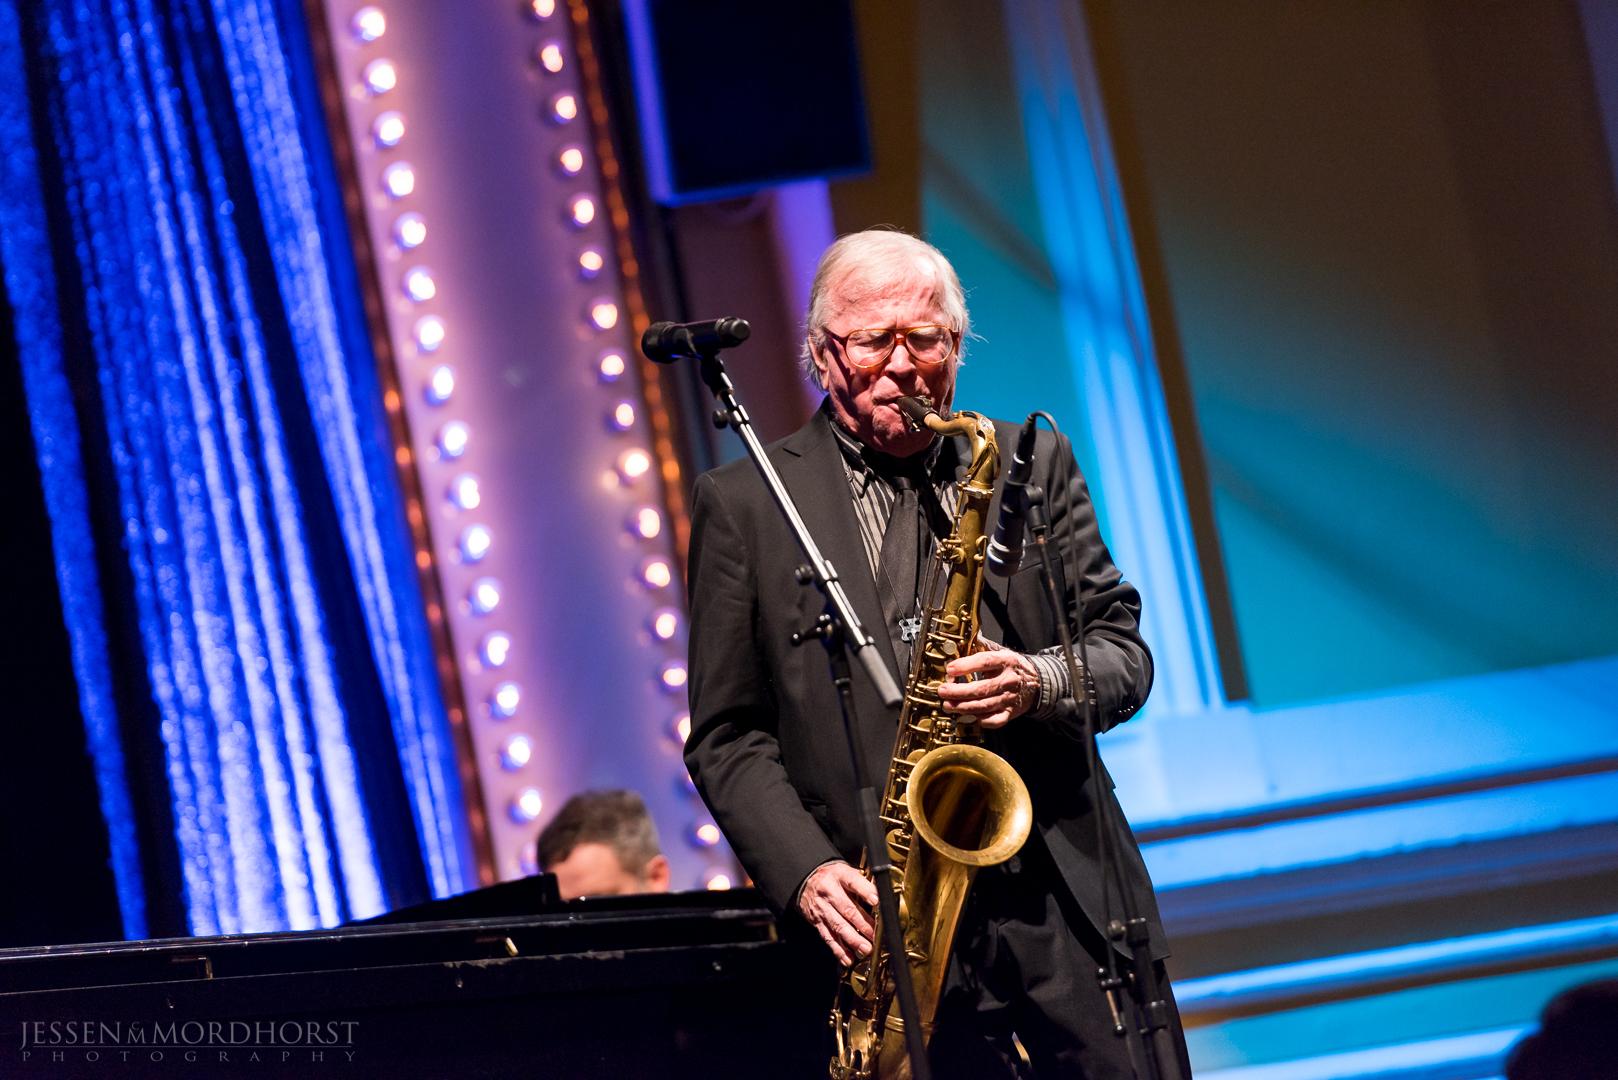 Klaus Doldinger (Ehrenpreis 2016)